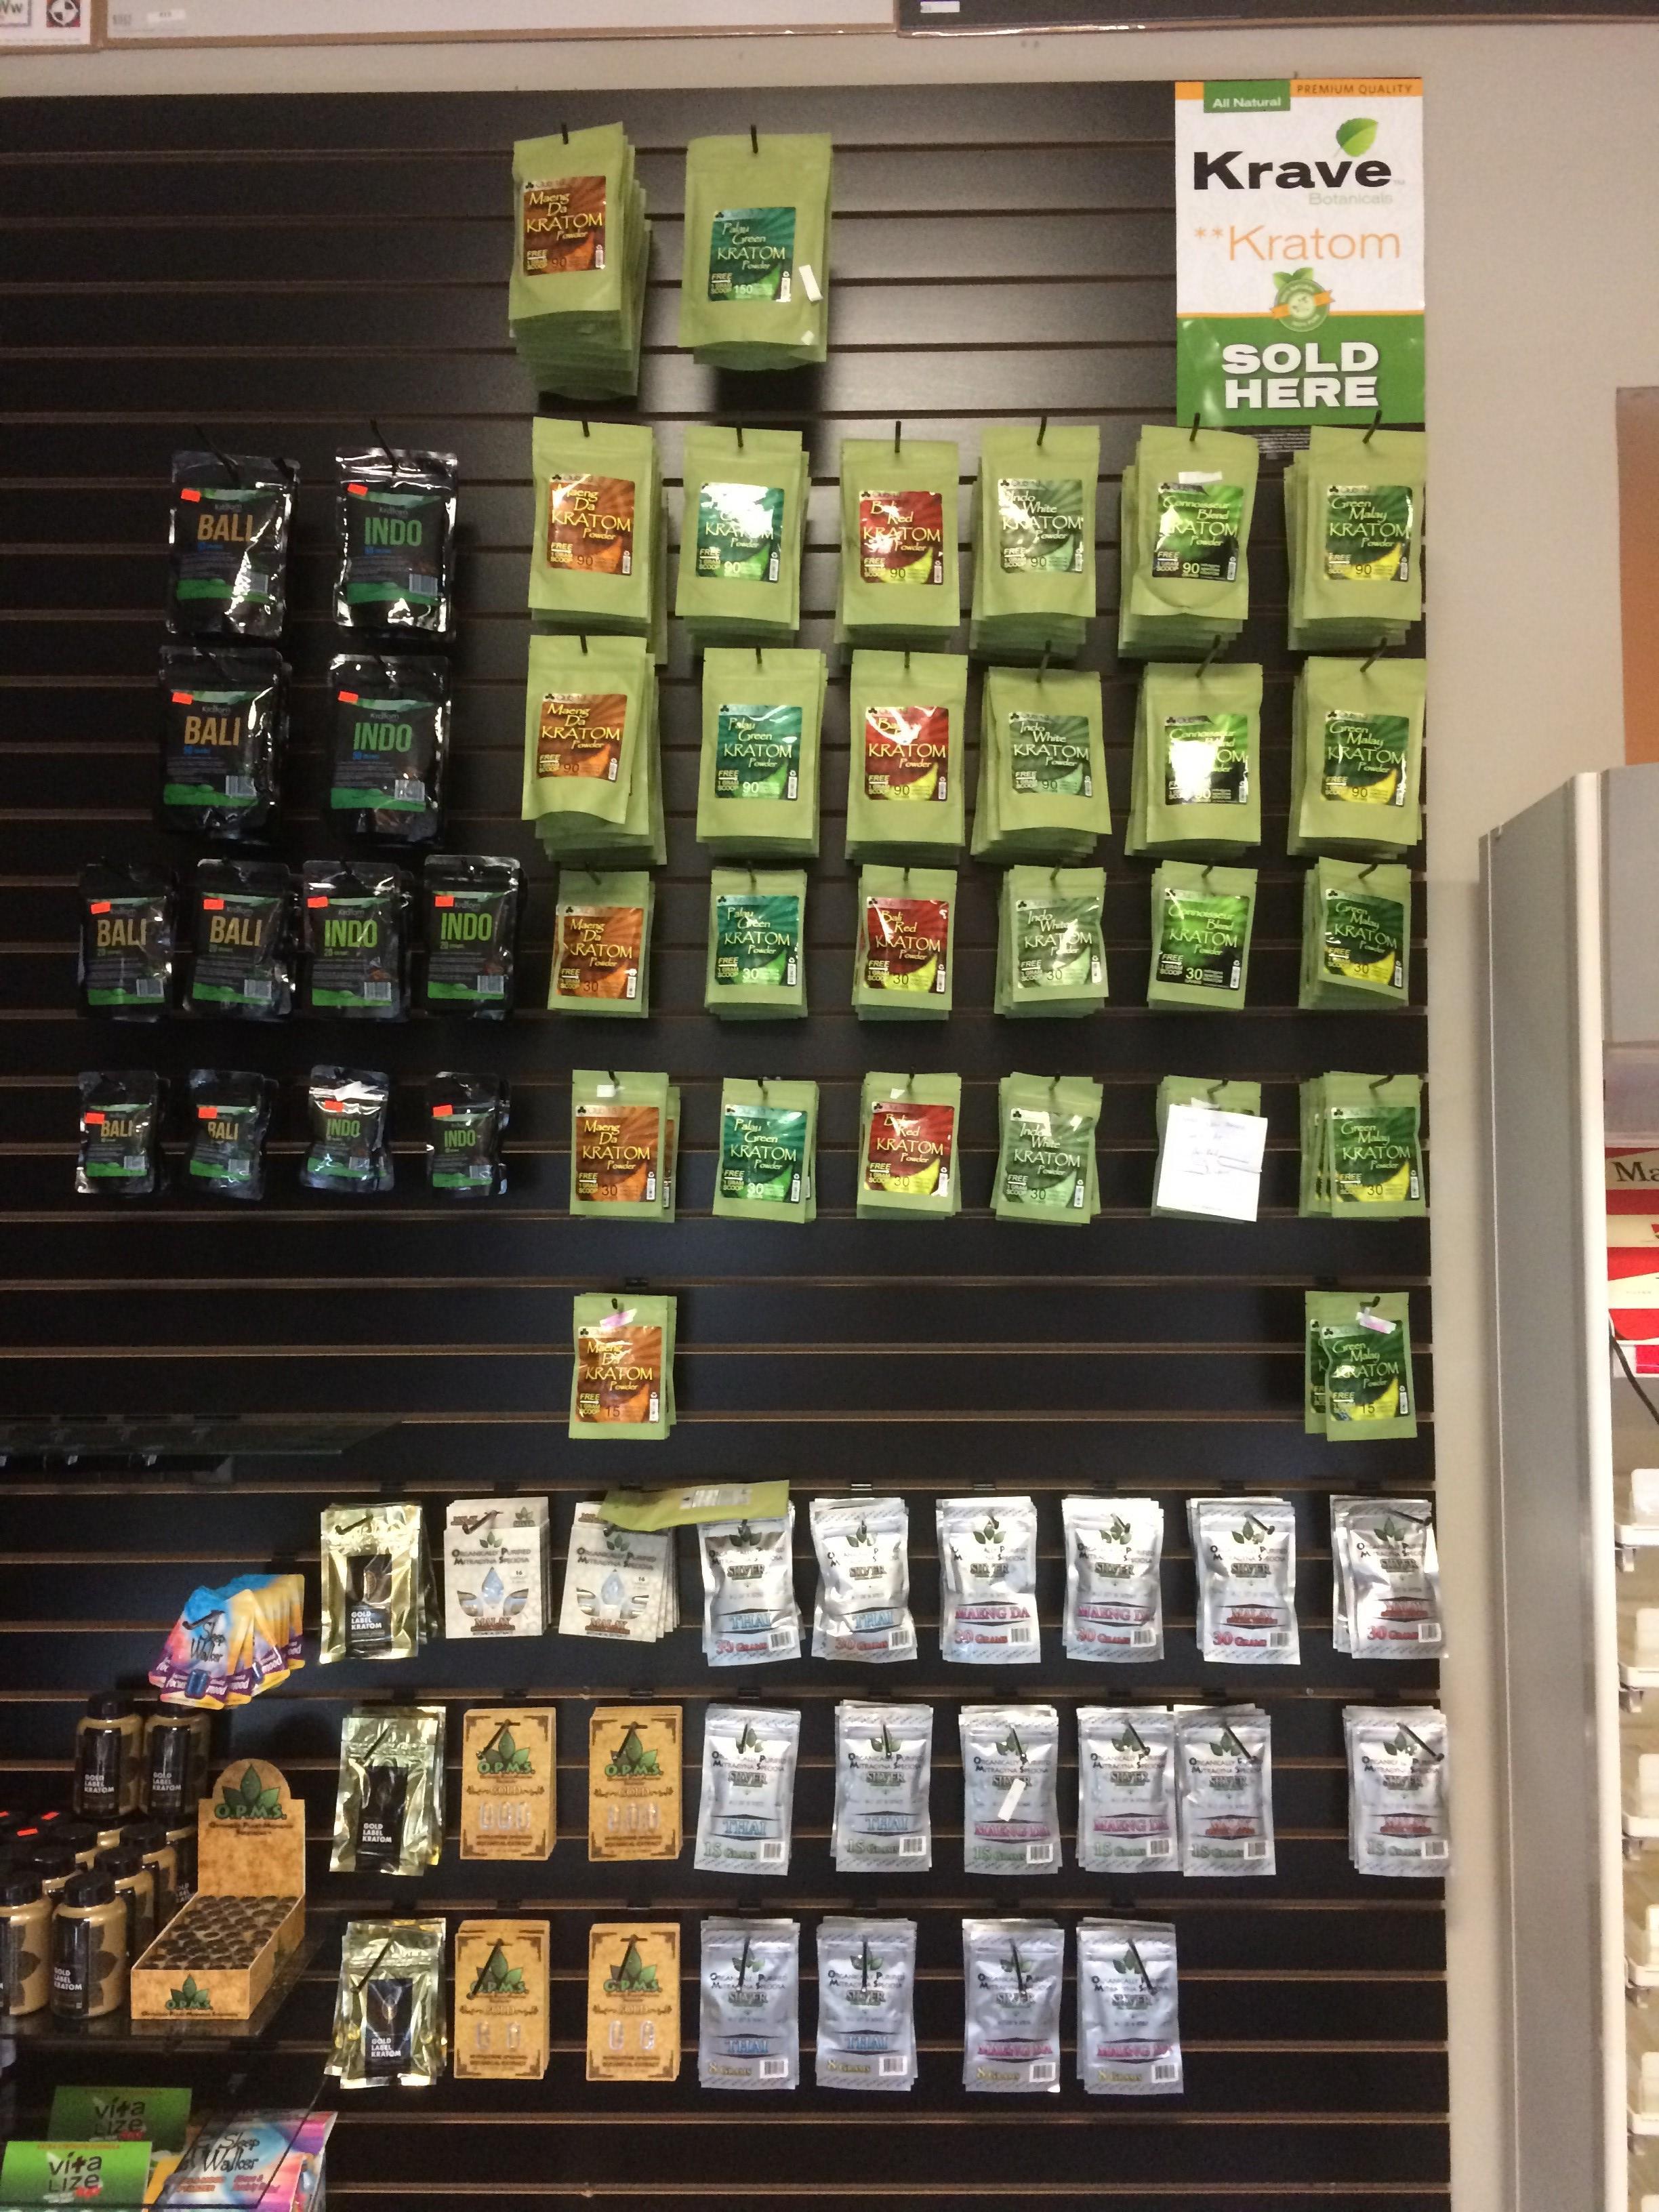 Cheeba Hut Smoke Shop 50189 Gratiot Ave, Chesterfield, MI